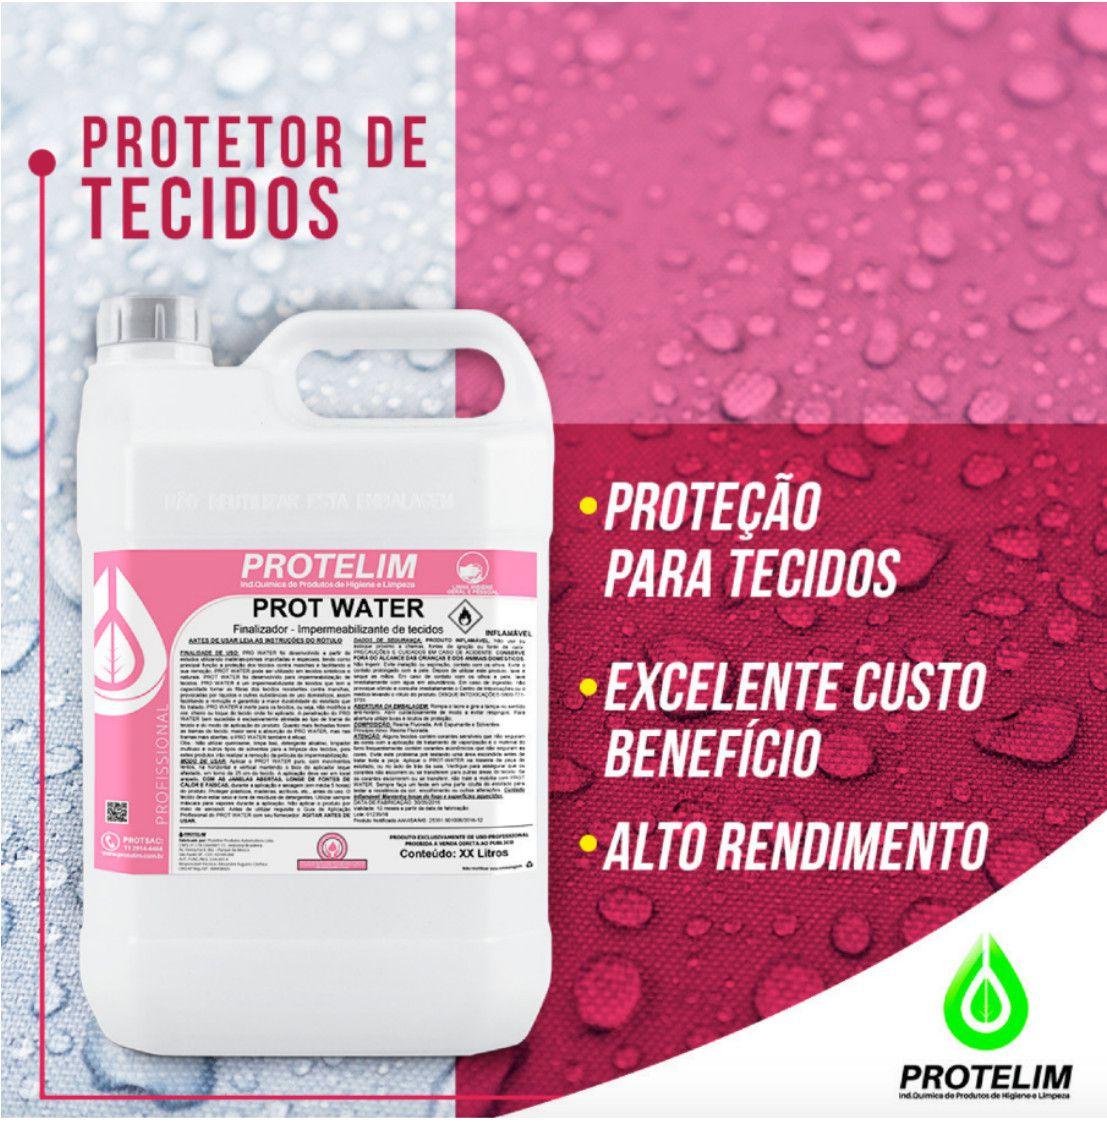 Impermeabilizante De Estofados e Tecidos Prot-water Protelim 5 Litros